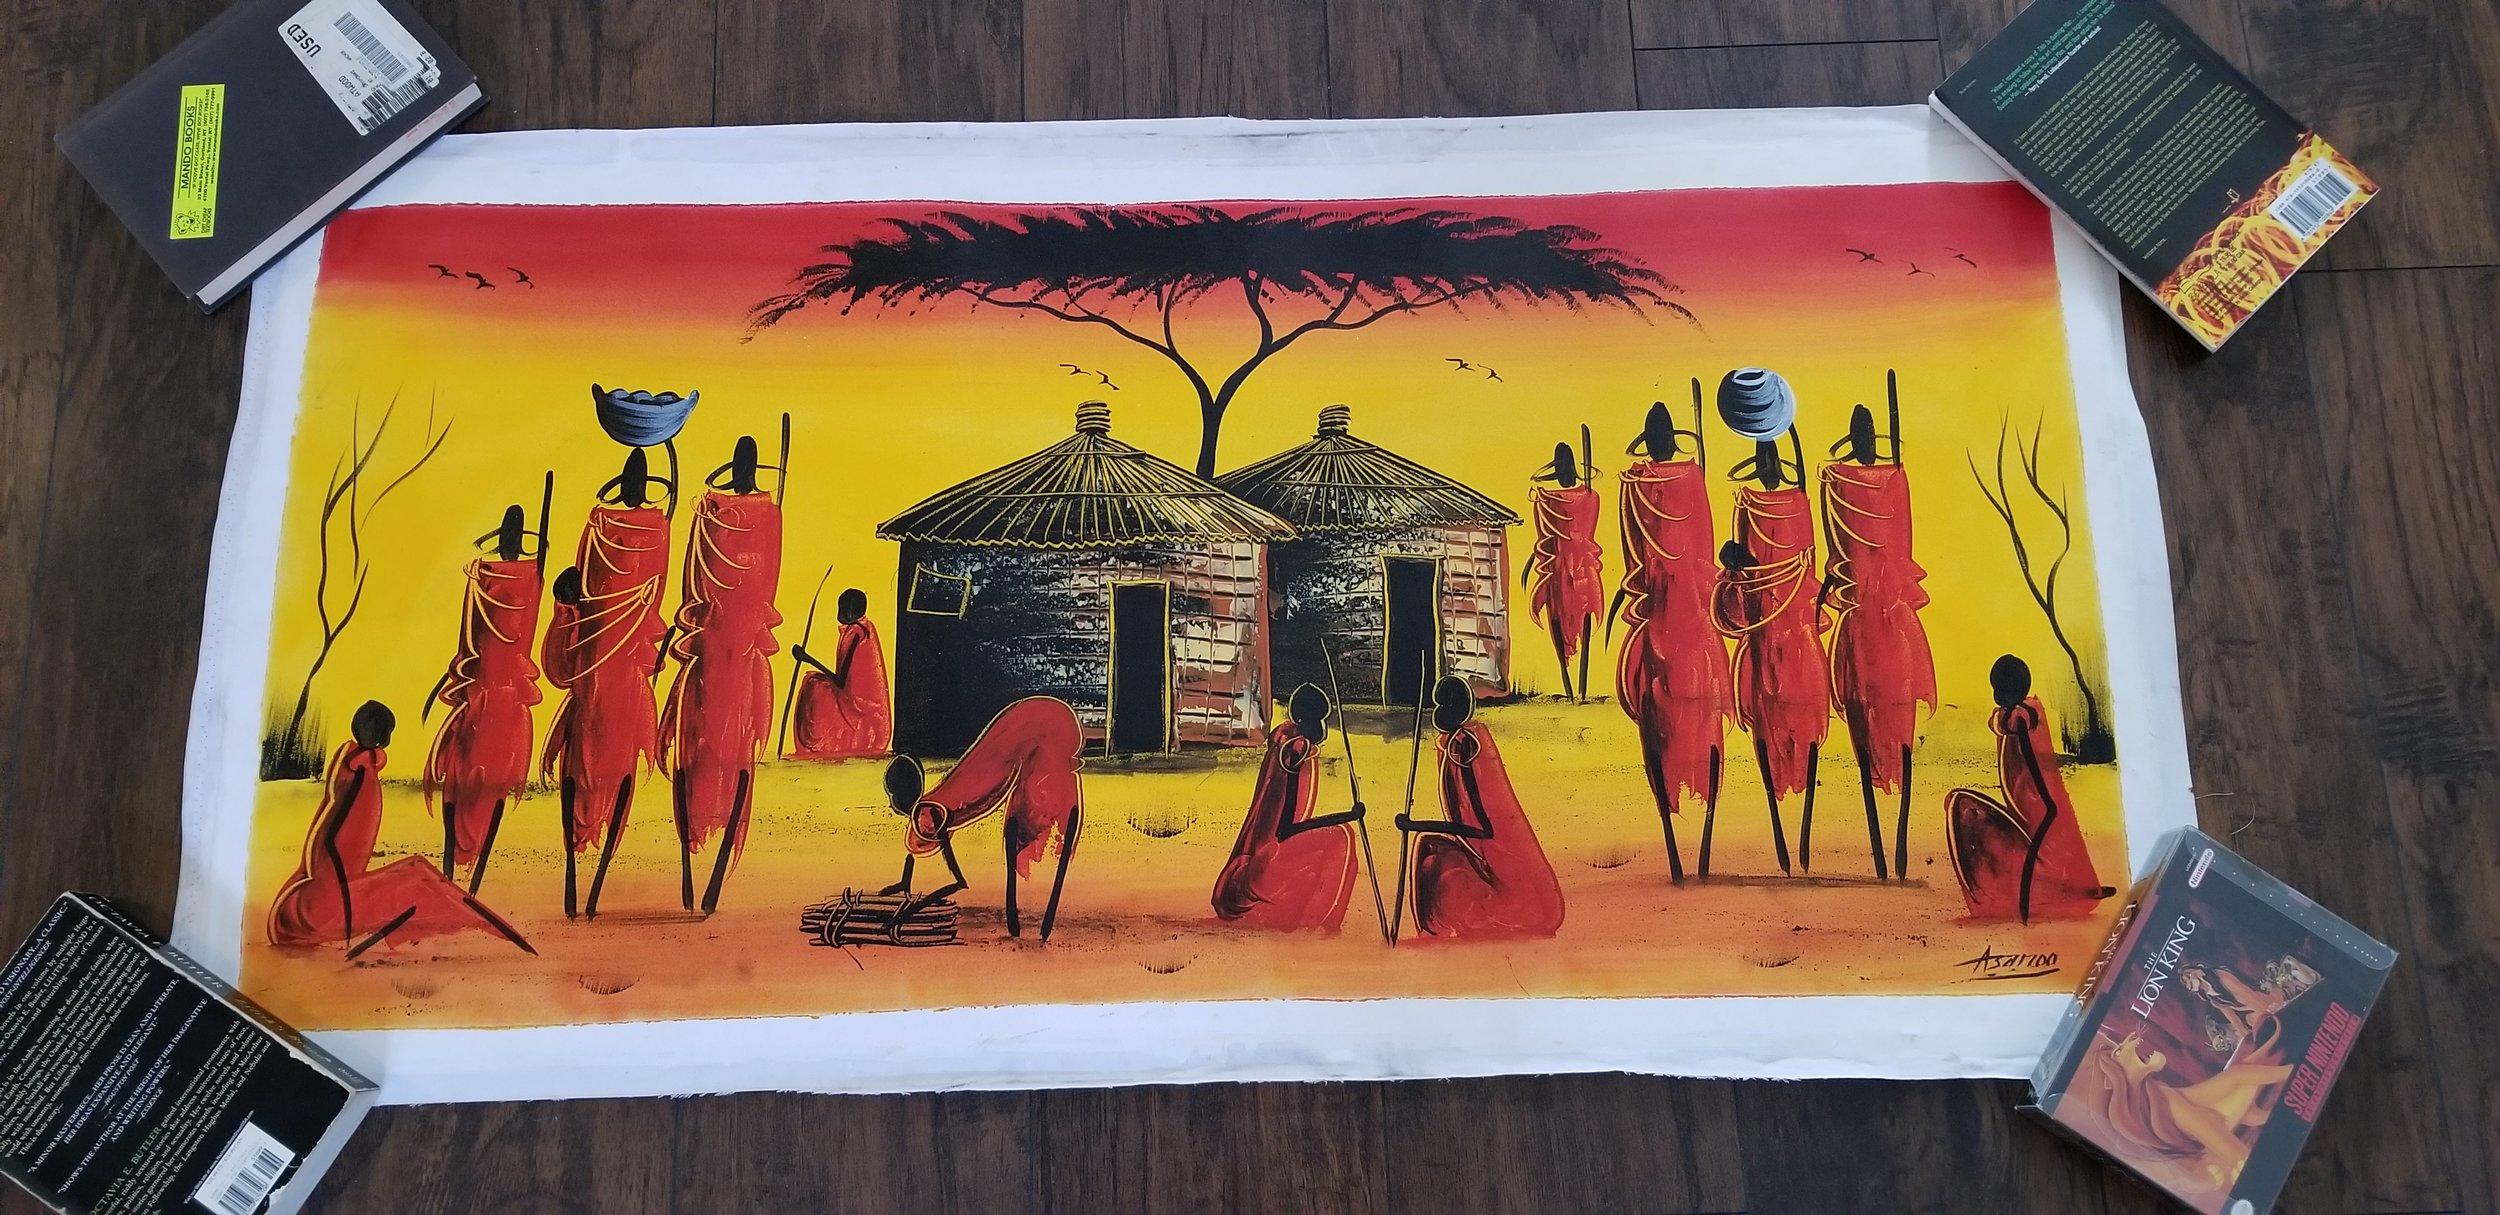 Massai painting (by Asanoo)